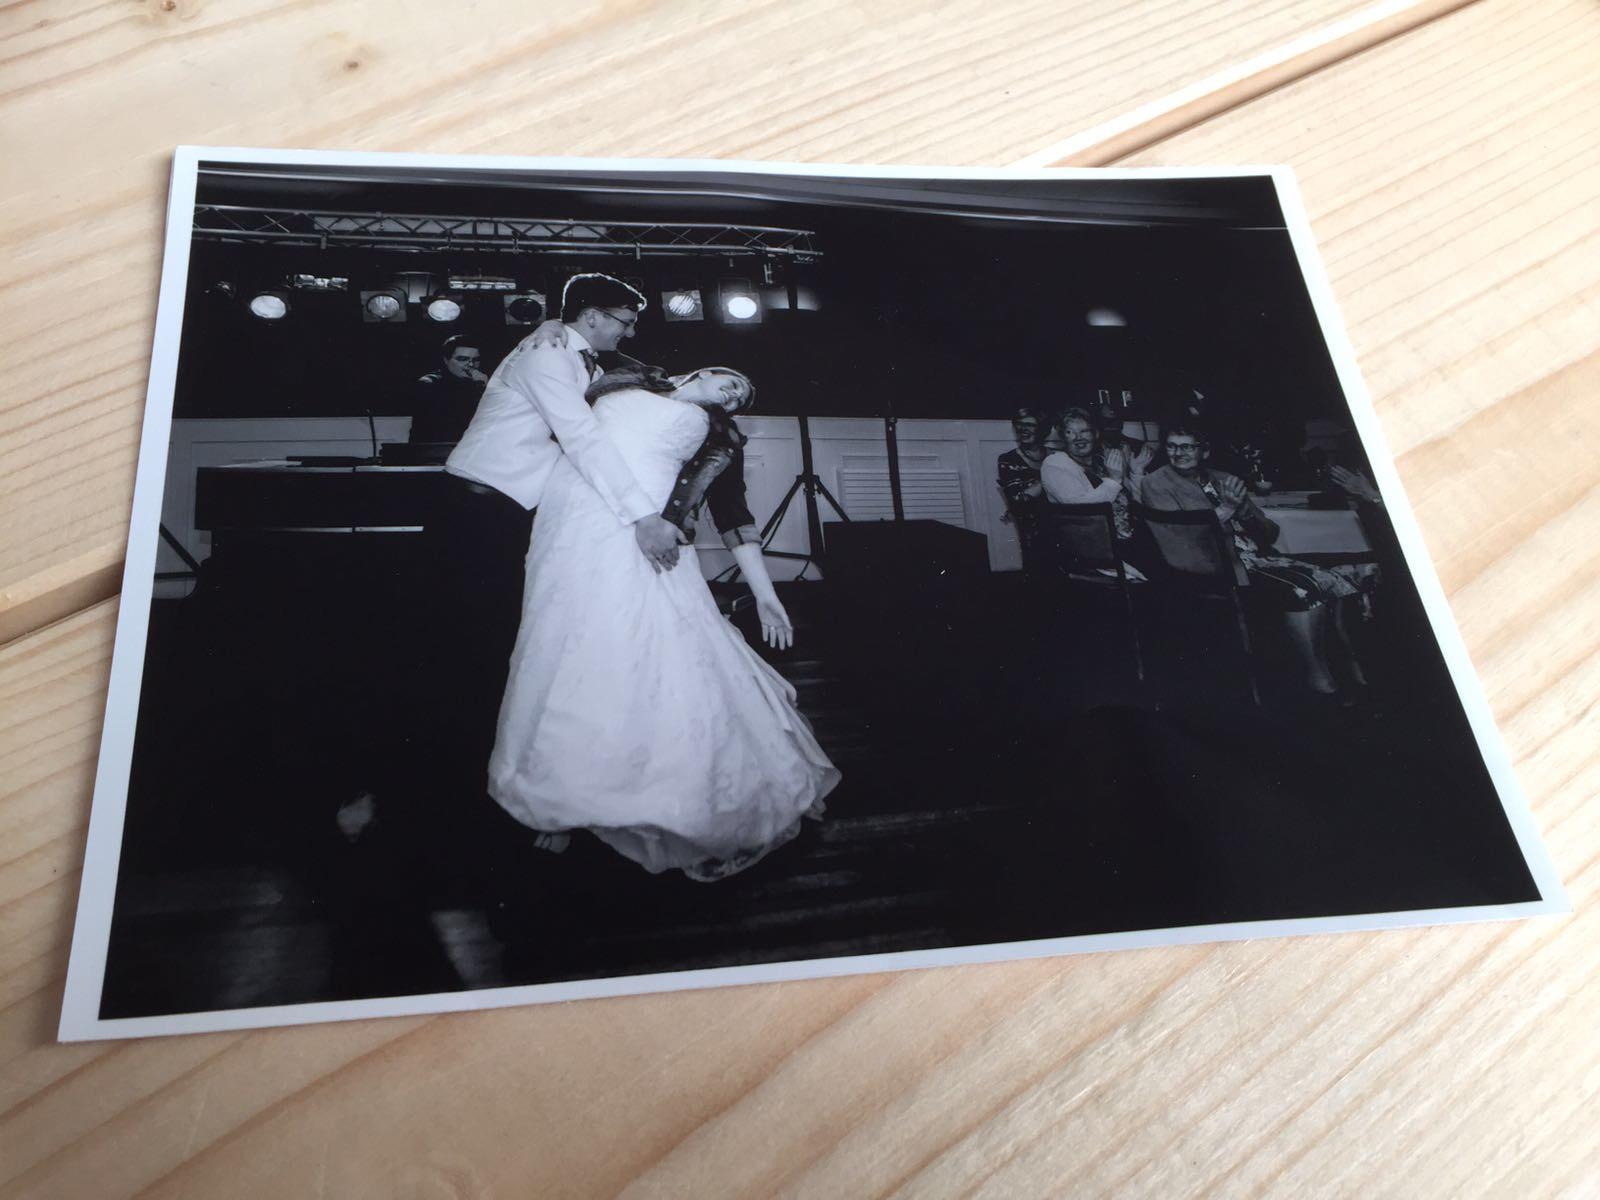 Mooie foto openingsdans bruiloft